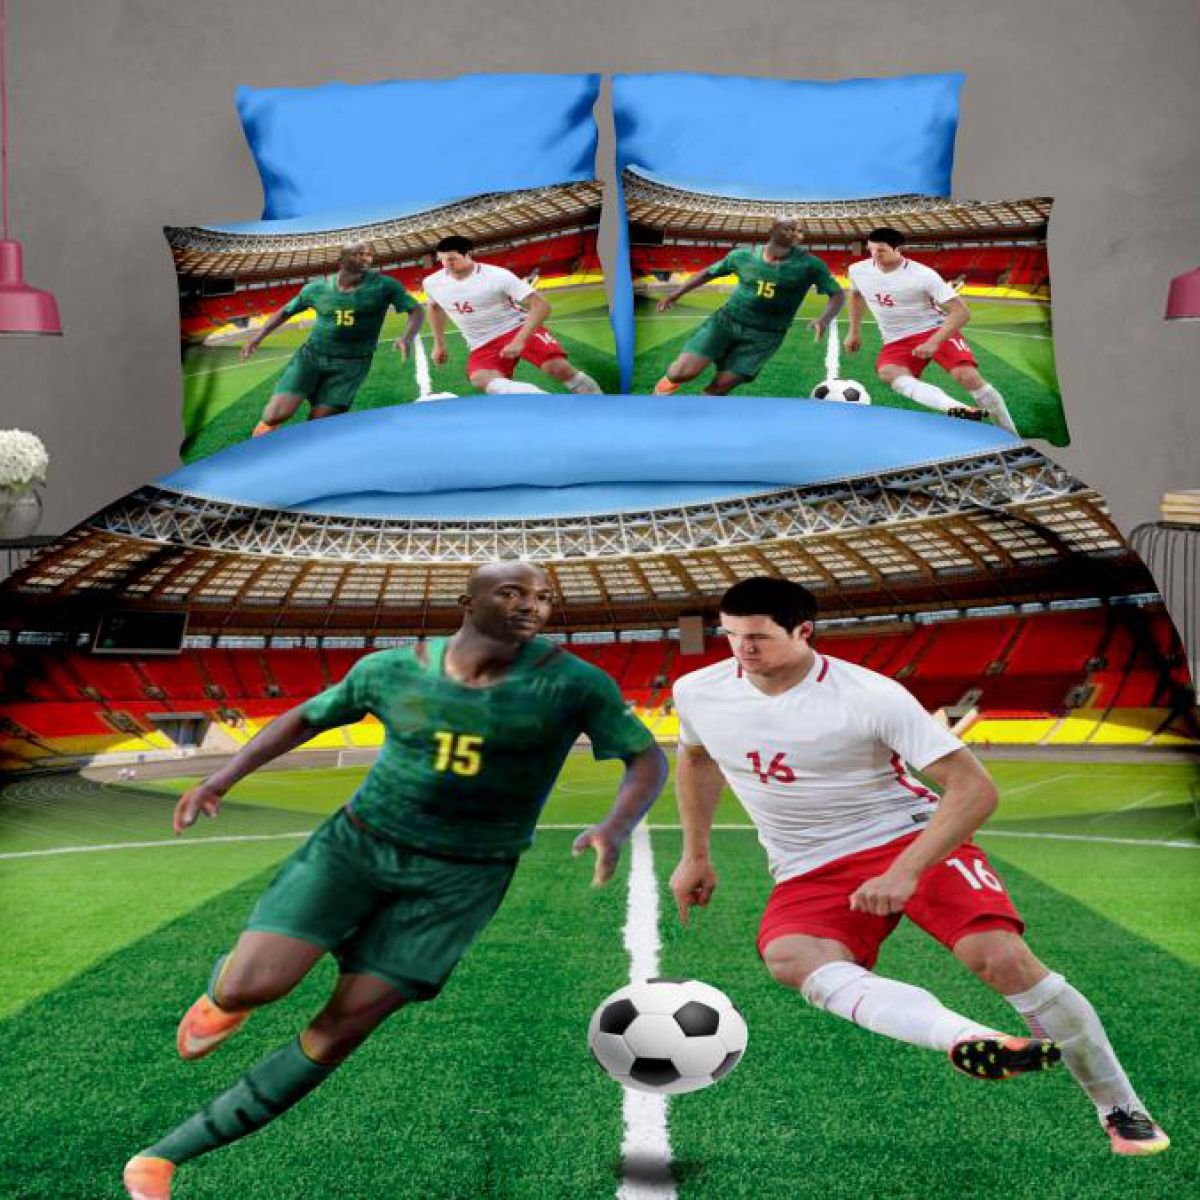 3D Beddings - Febe - Football - FPW-402-01 - 160x200 cm - 3 pcs